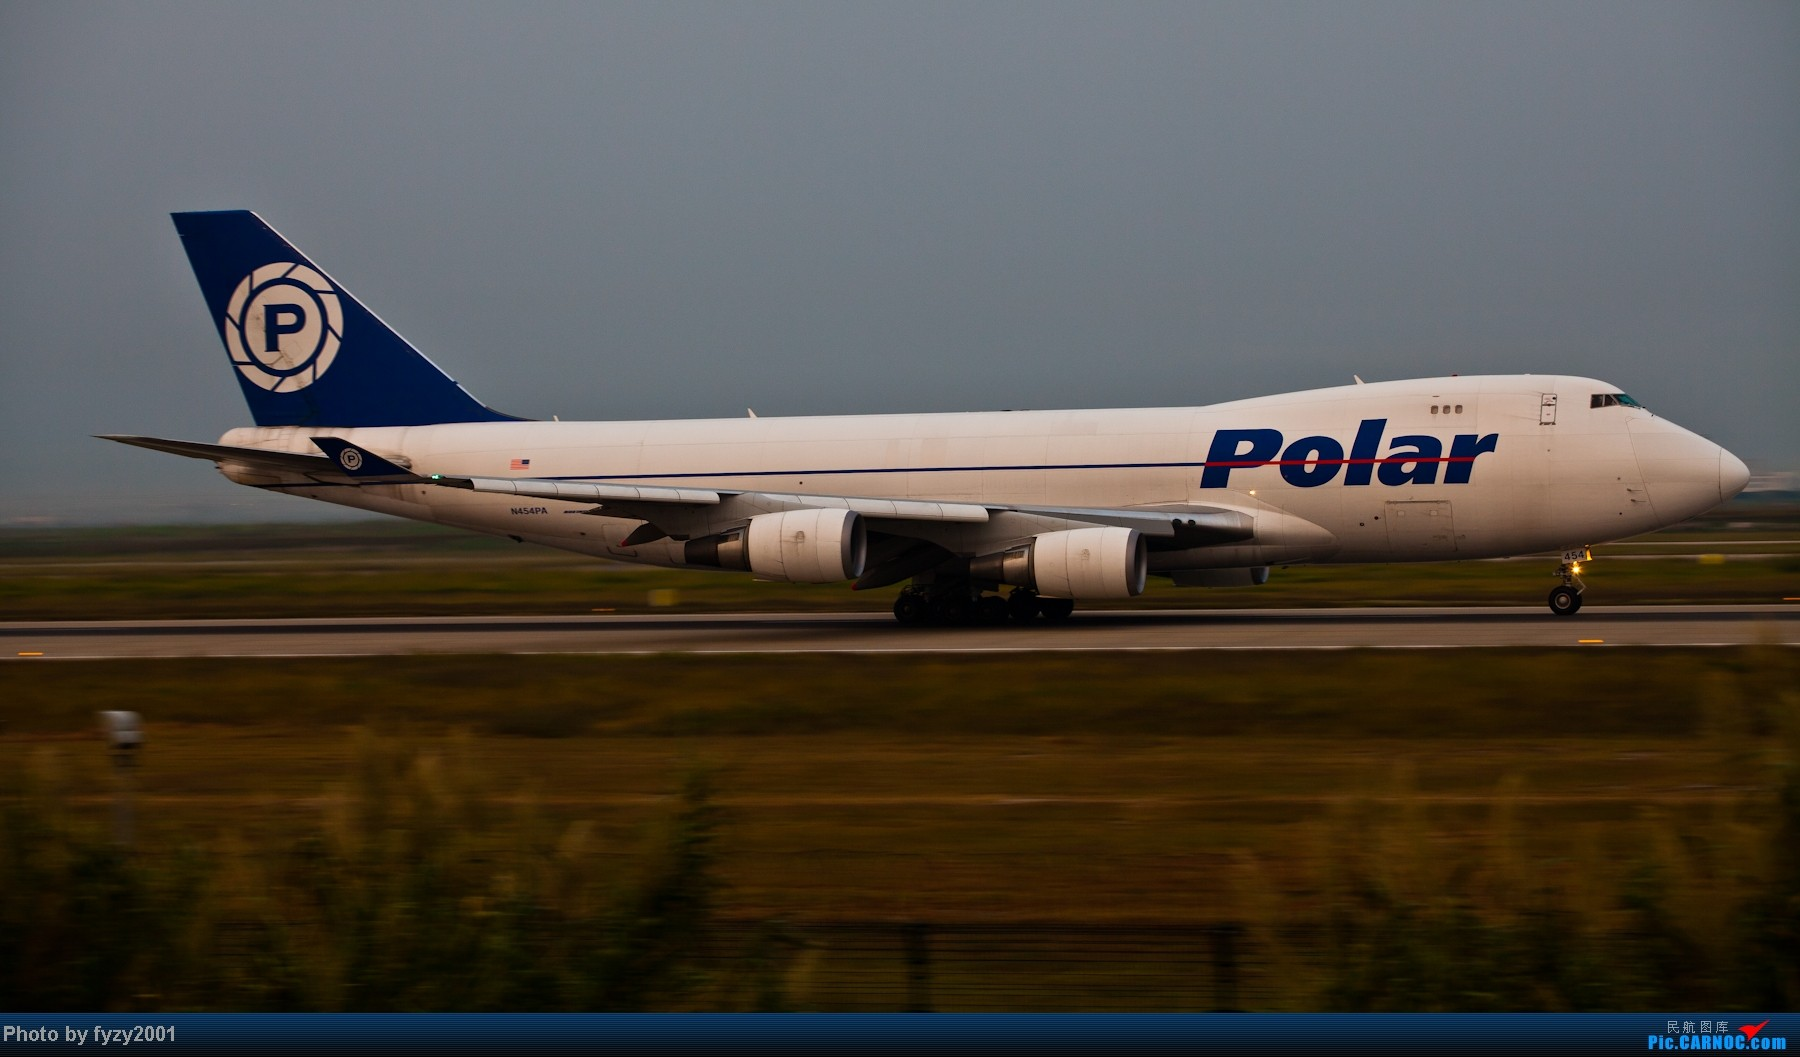 Re:[原创][无锡西站]长假PVG蹲守~~~~只发大图,多图杀猫~~~~ BOEING 747-400F N454PA 中国上海浦东机场